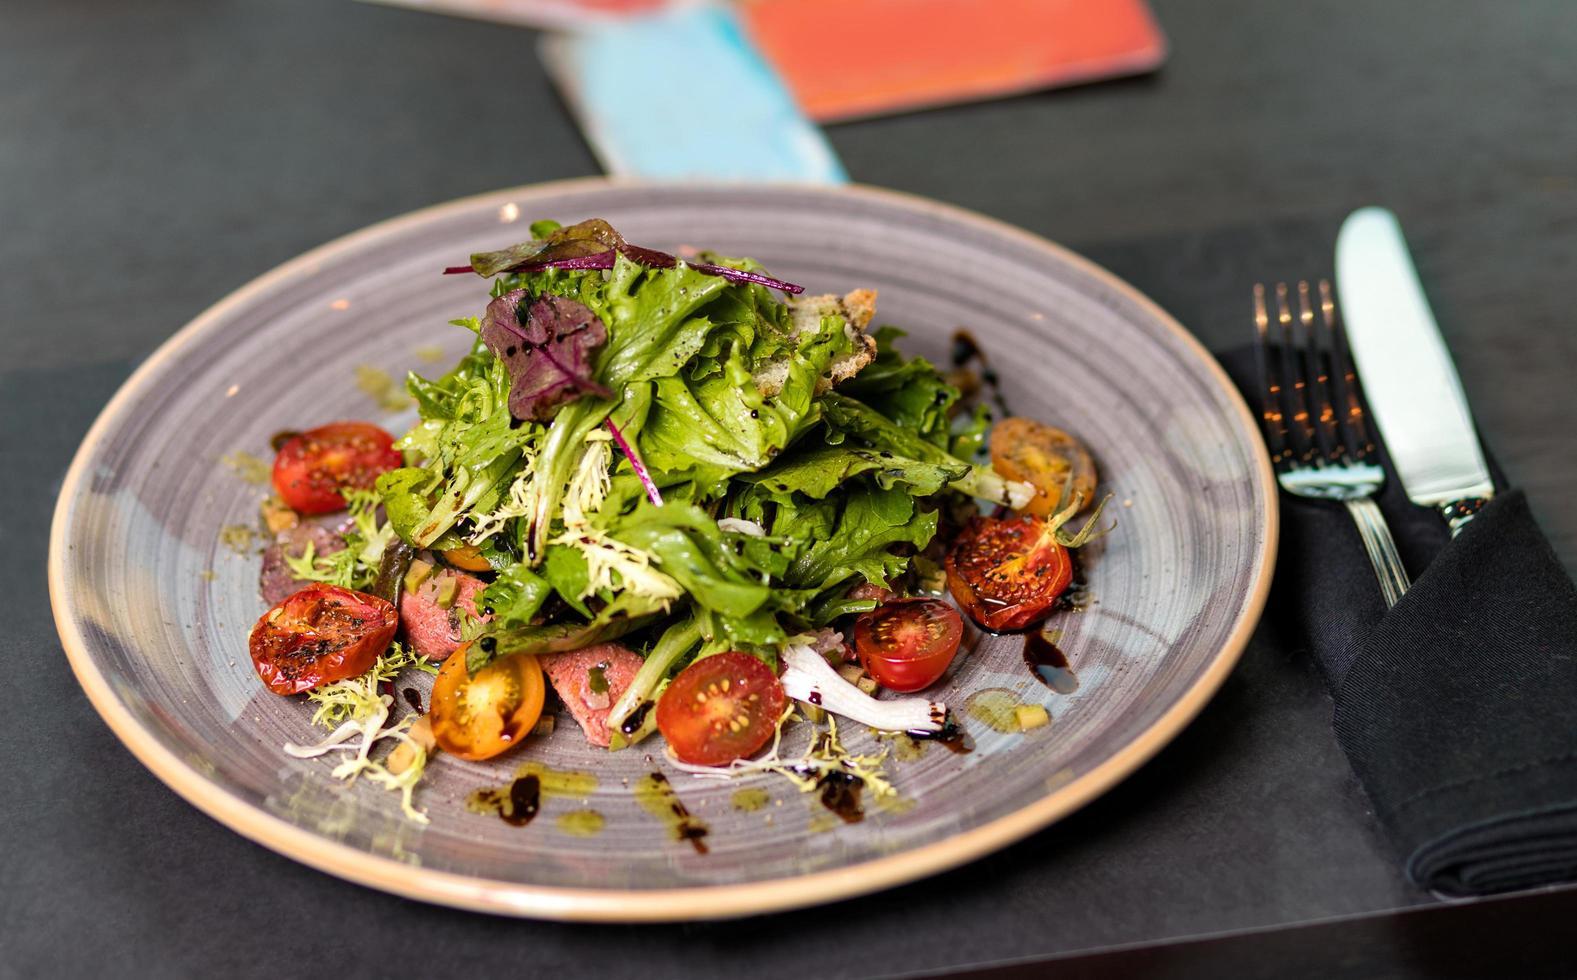 salade verte hachée photo